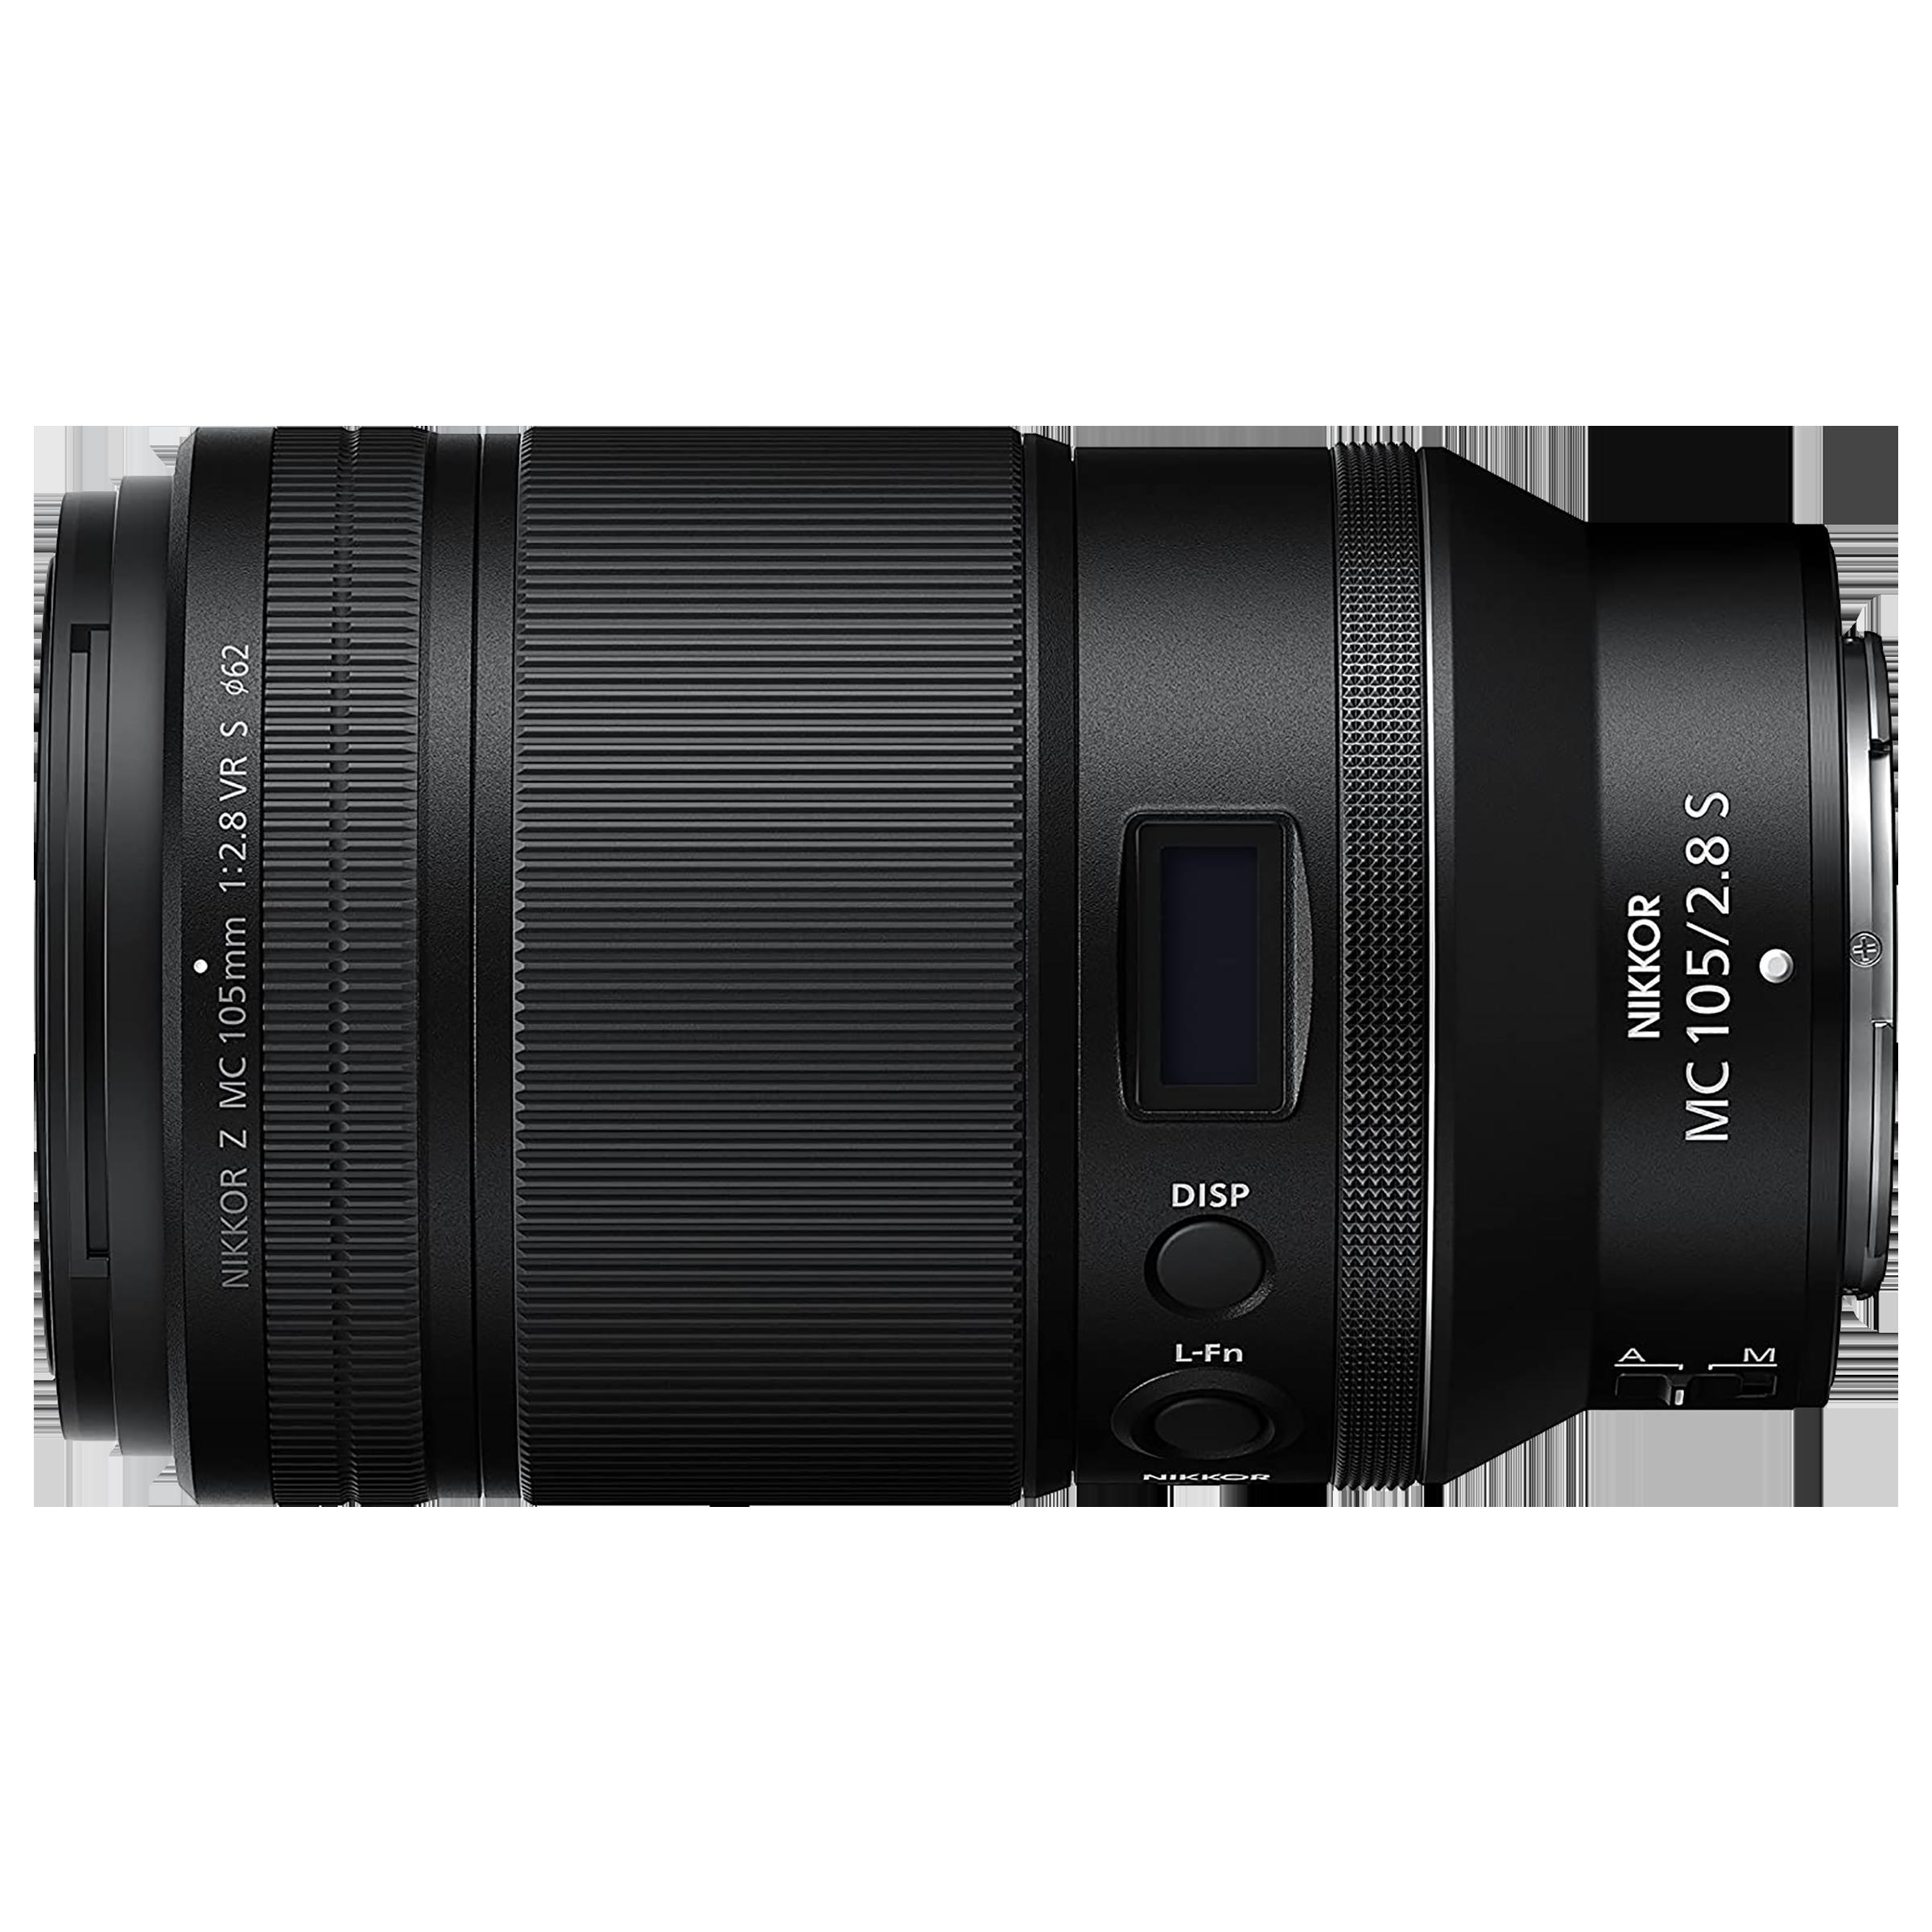 Lens - Nikon Nikkor Z MC 105mm f/2.8 VR S105 mm F32-F2.8 Macro Lens (1:1 Magnification, JMA602DA, Black)_4